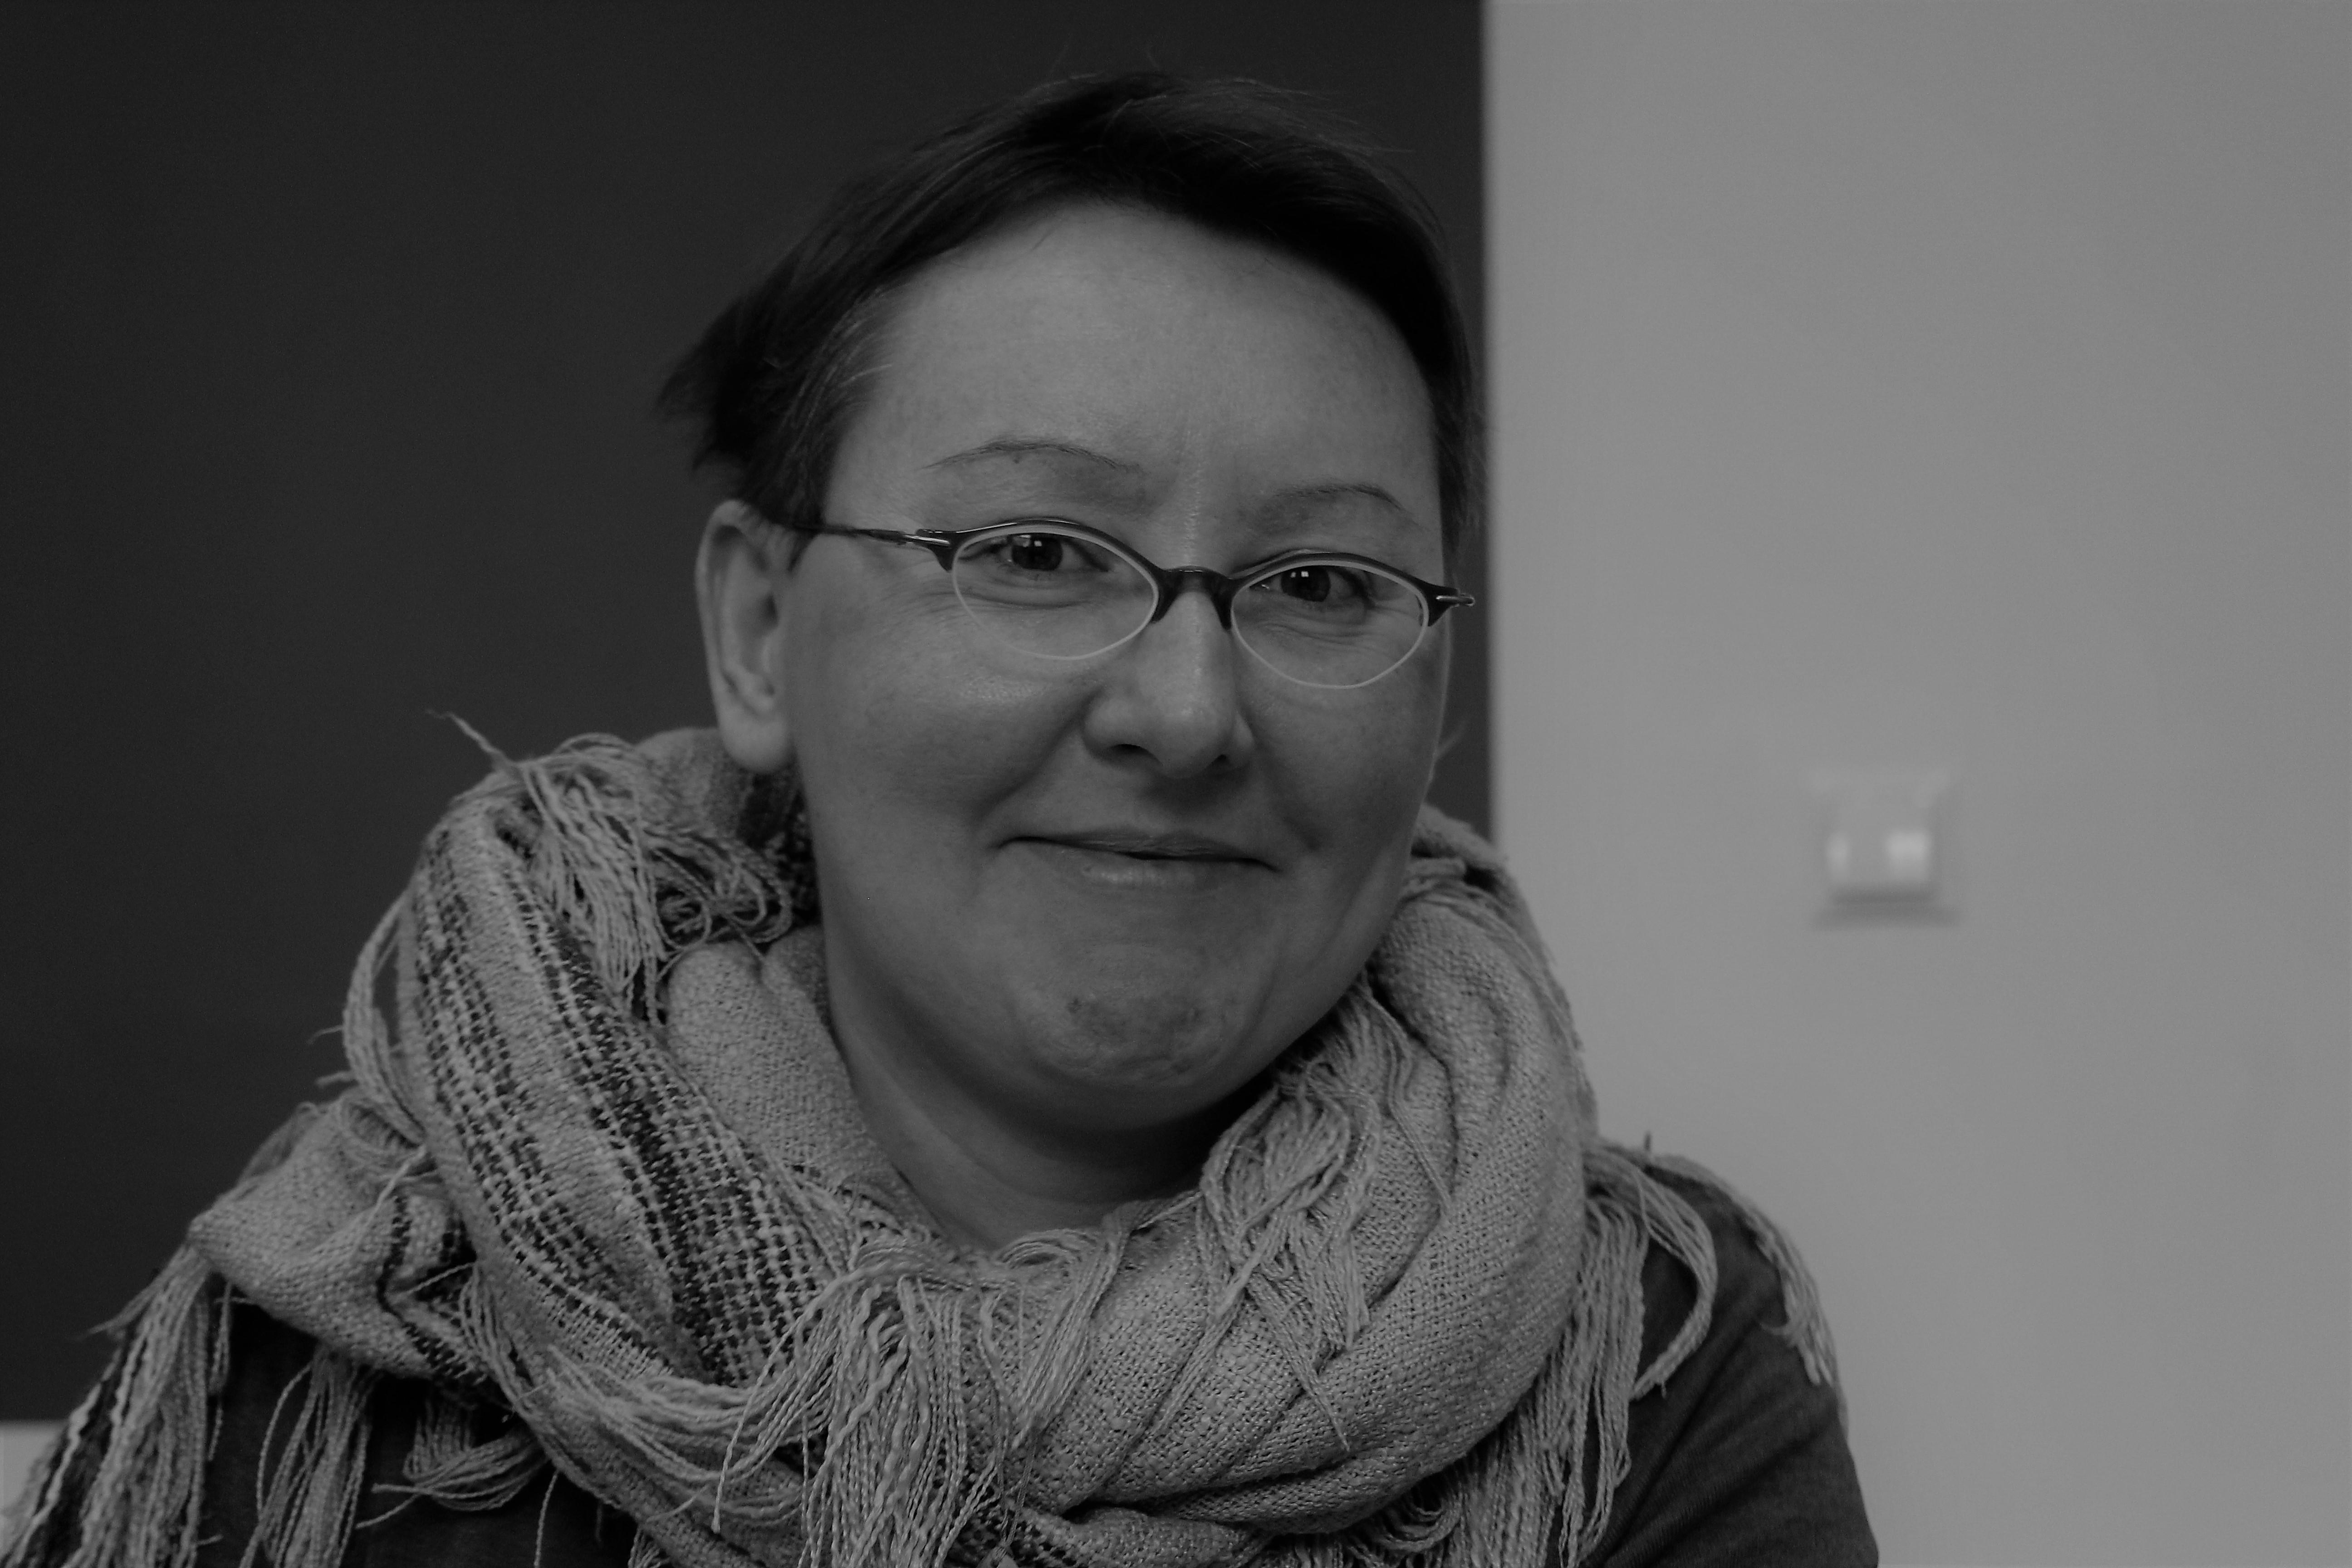 Anna Szmyd